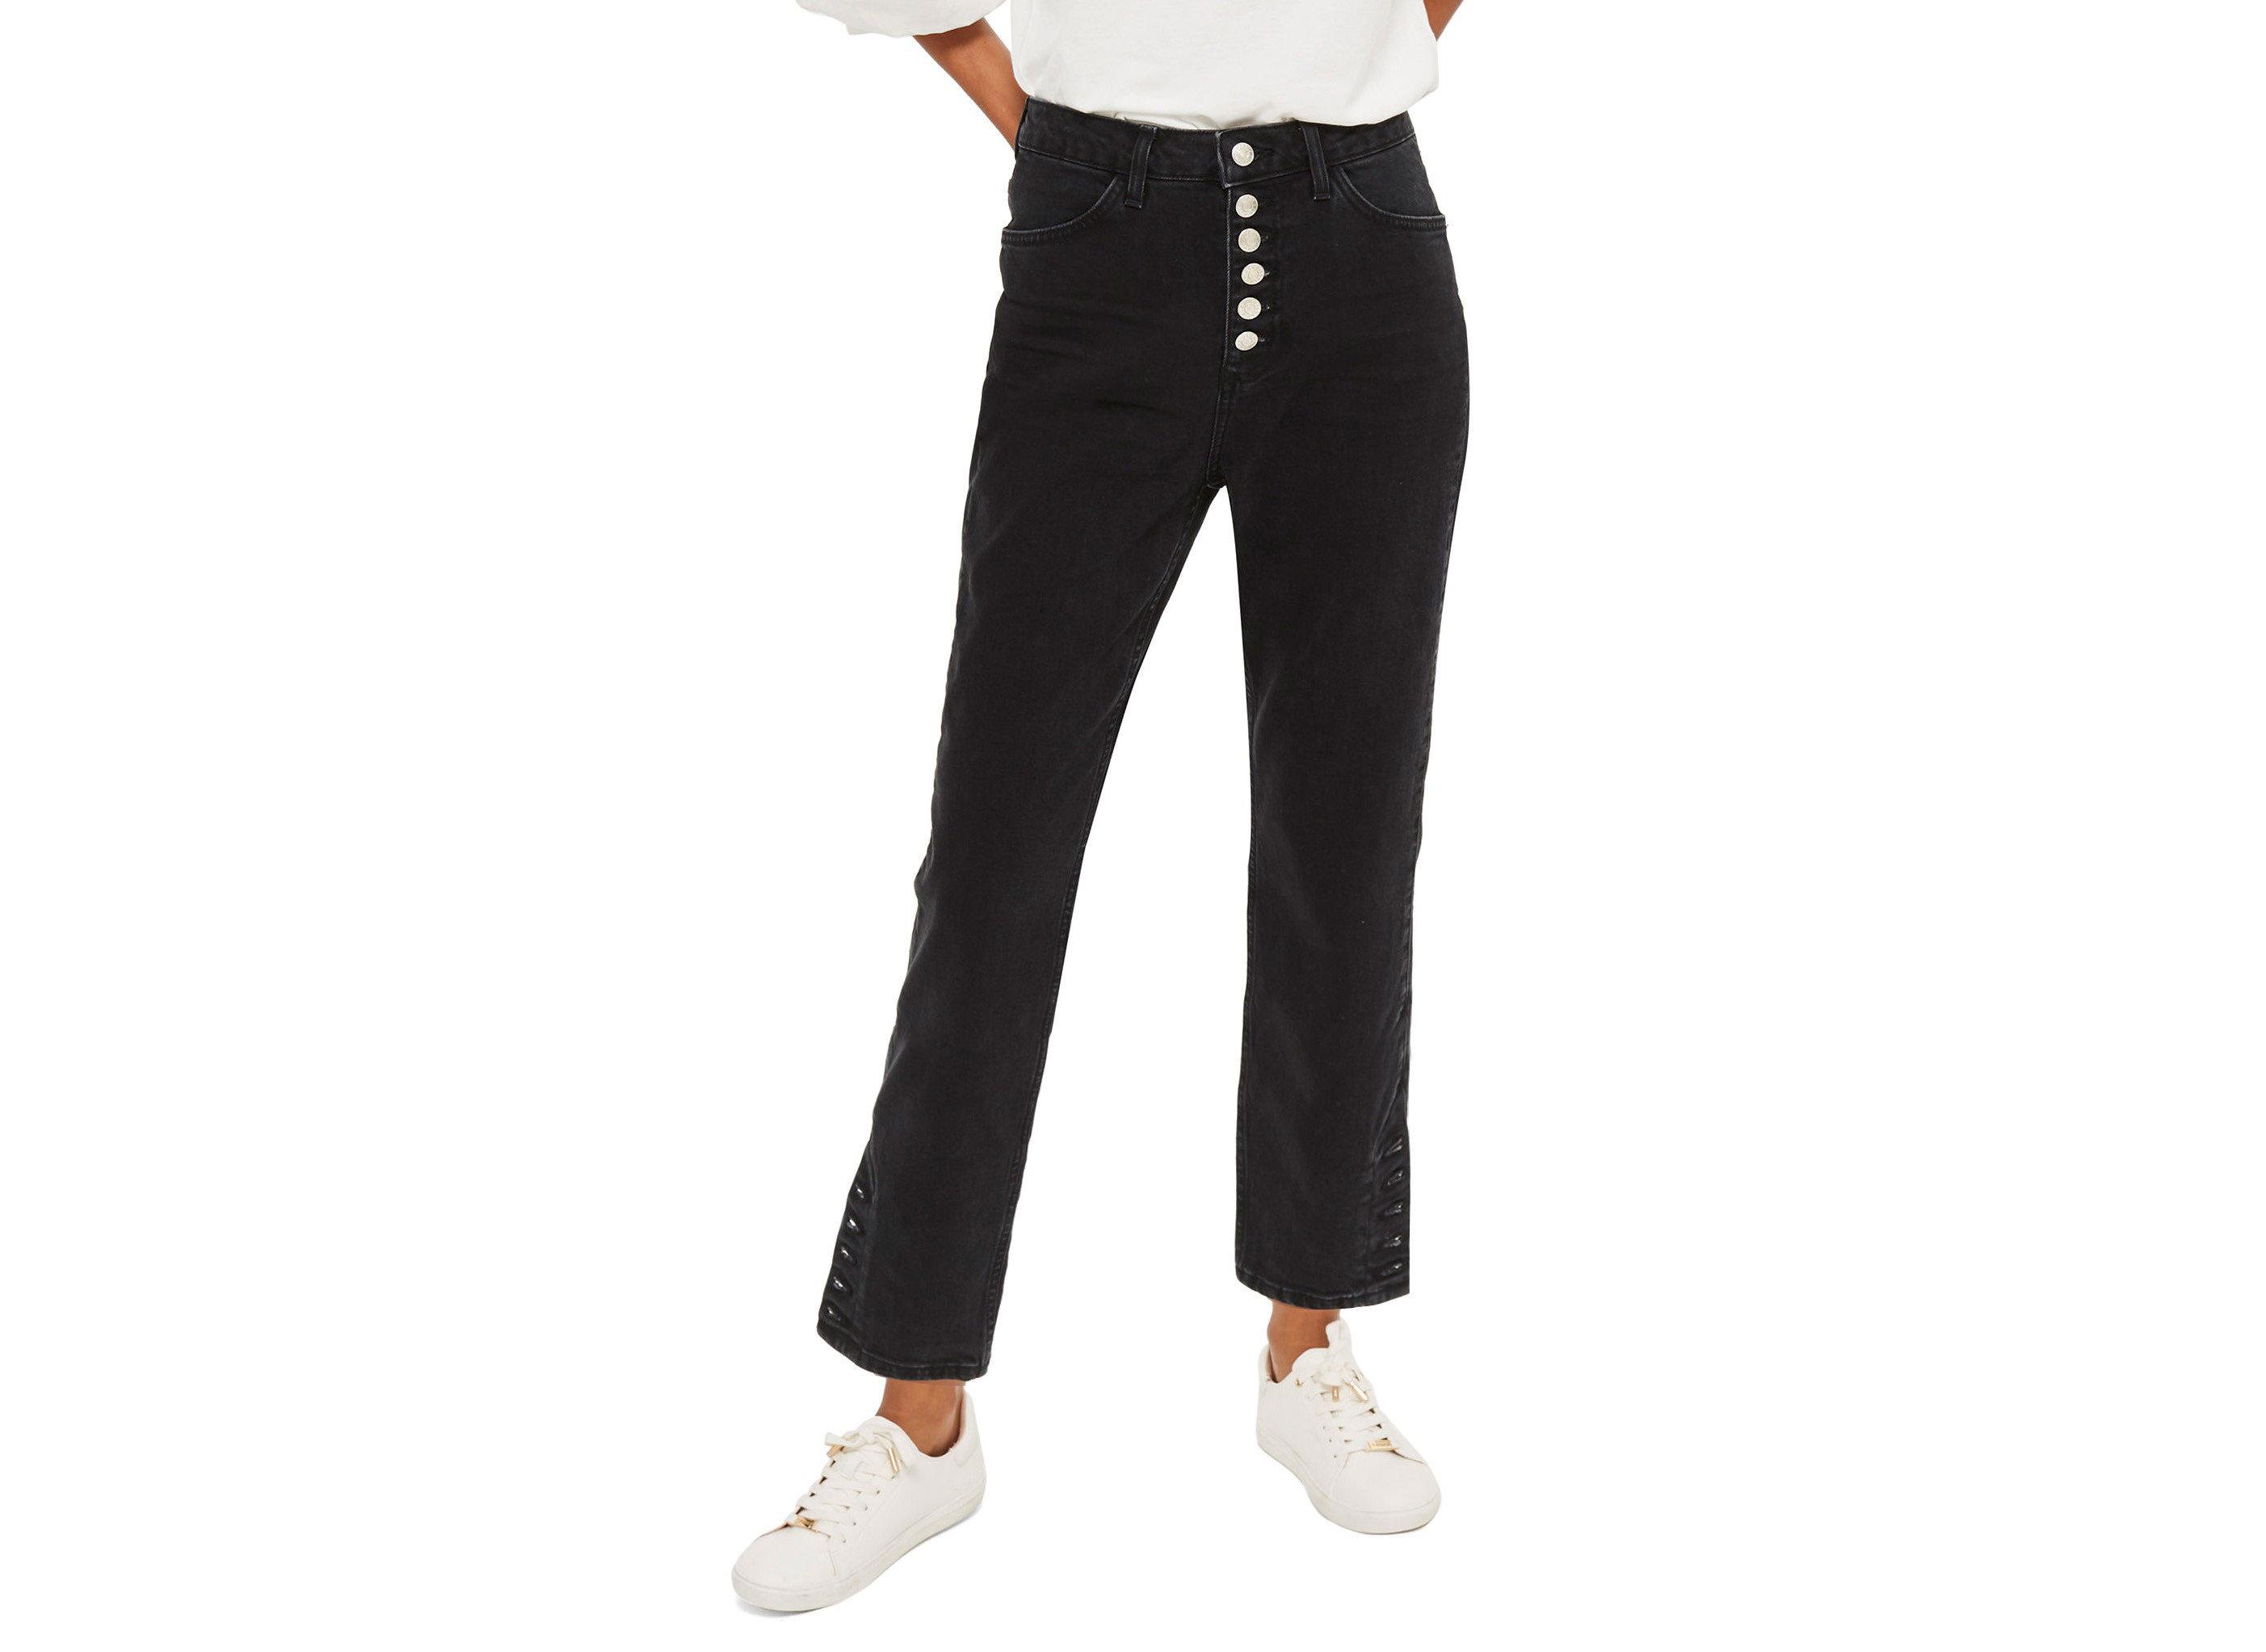 Hotels Style + Design Trip Ideas person jeans waist trouser standing active pants trousers trunk abdomen joint denim posing shoe